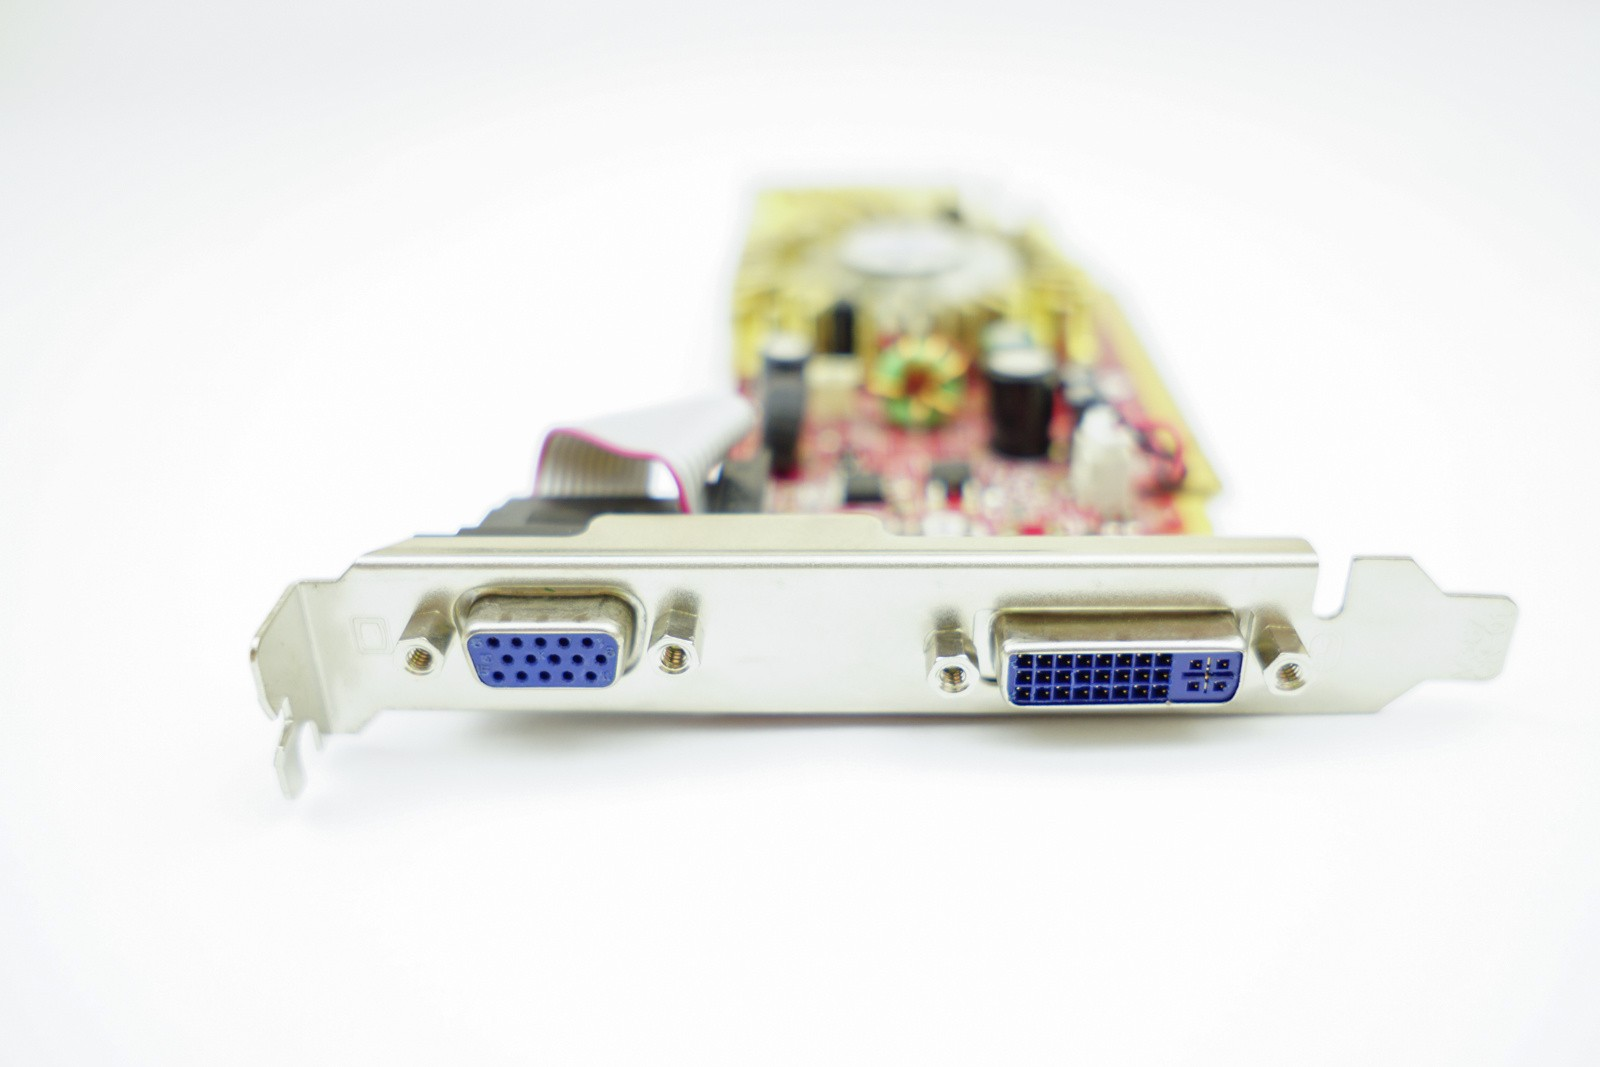 MSI 8400GS 256MB DESCARGAR DRIVER